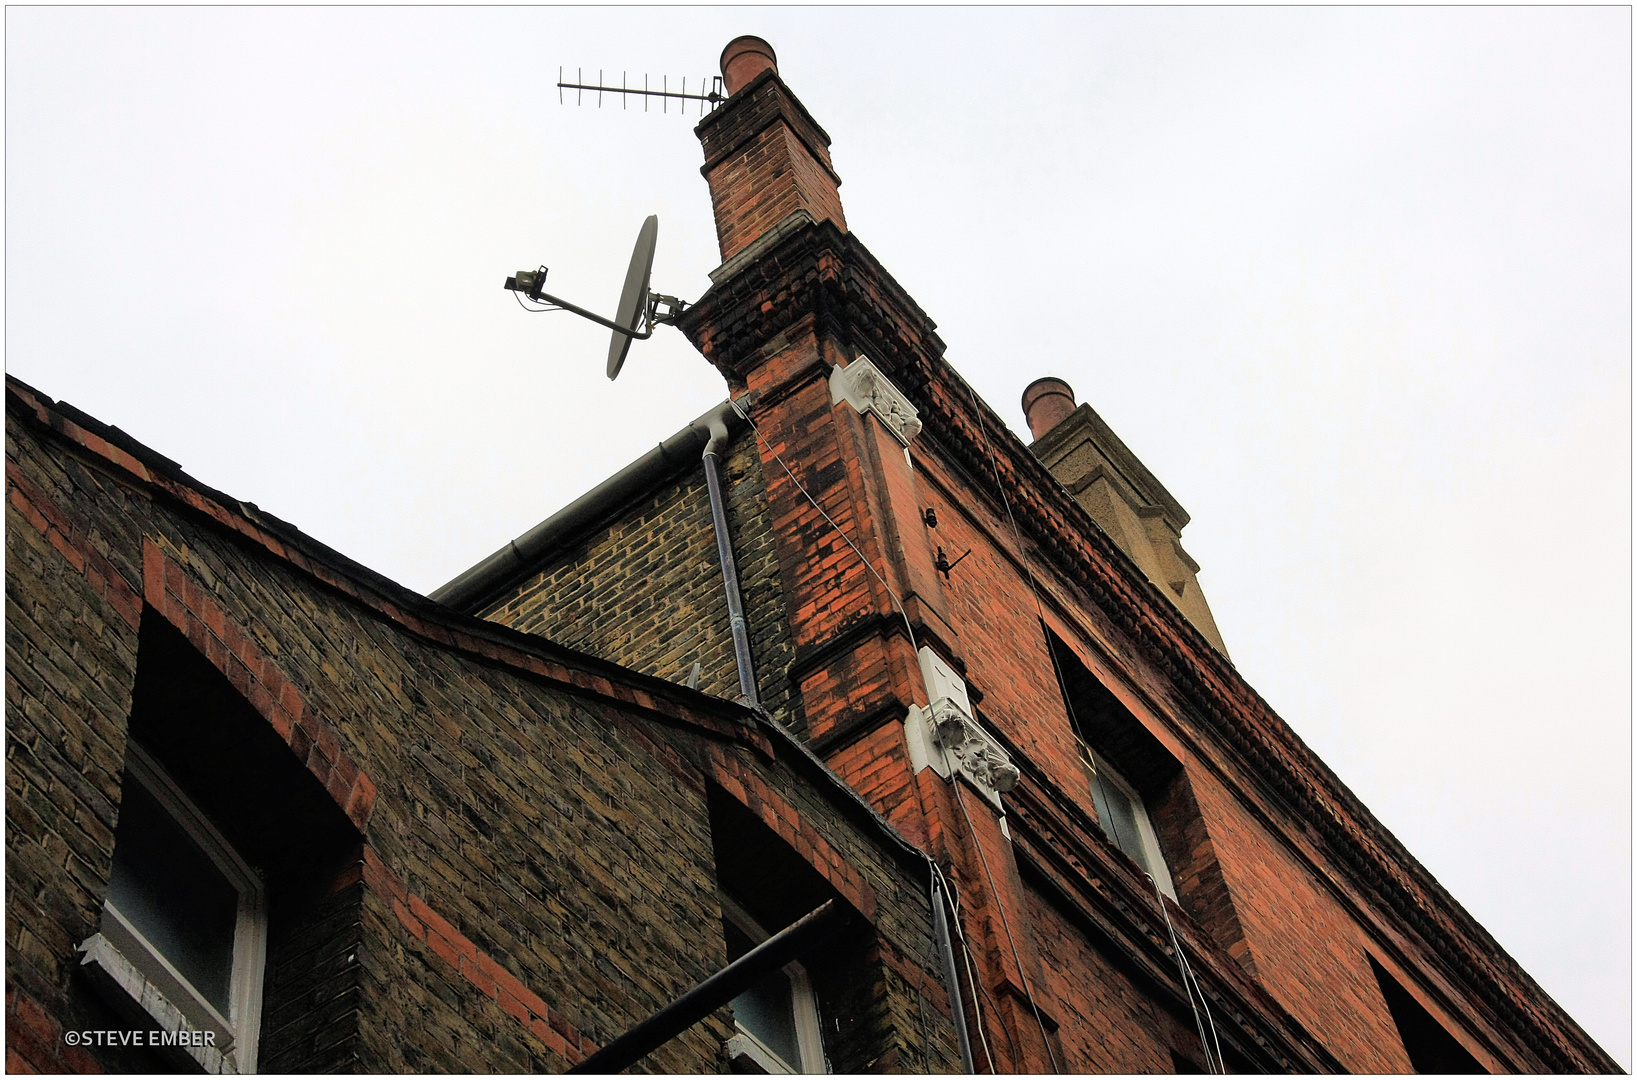 Old Brick + High Tech - A Southwark Impression